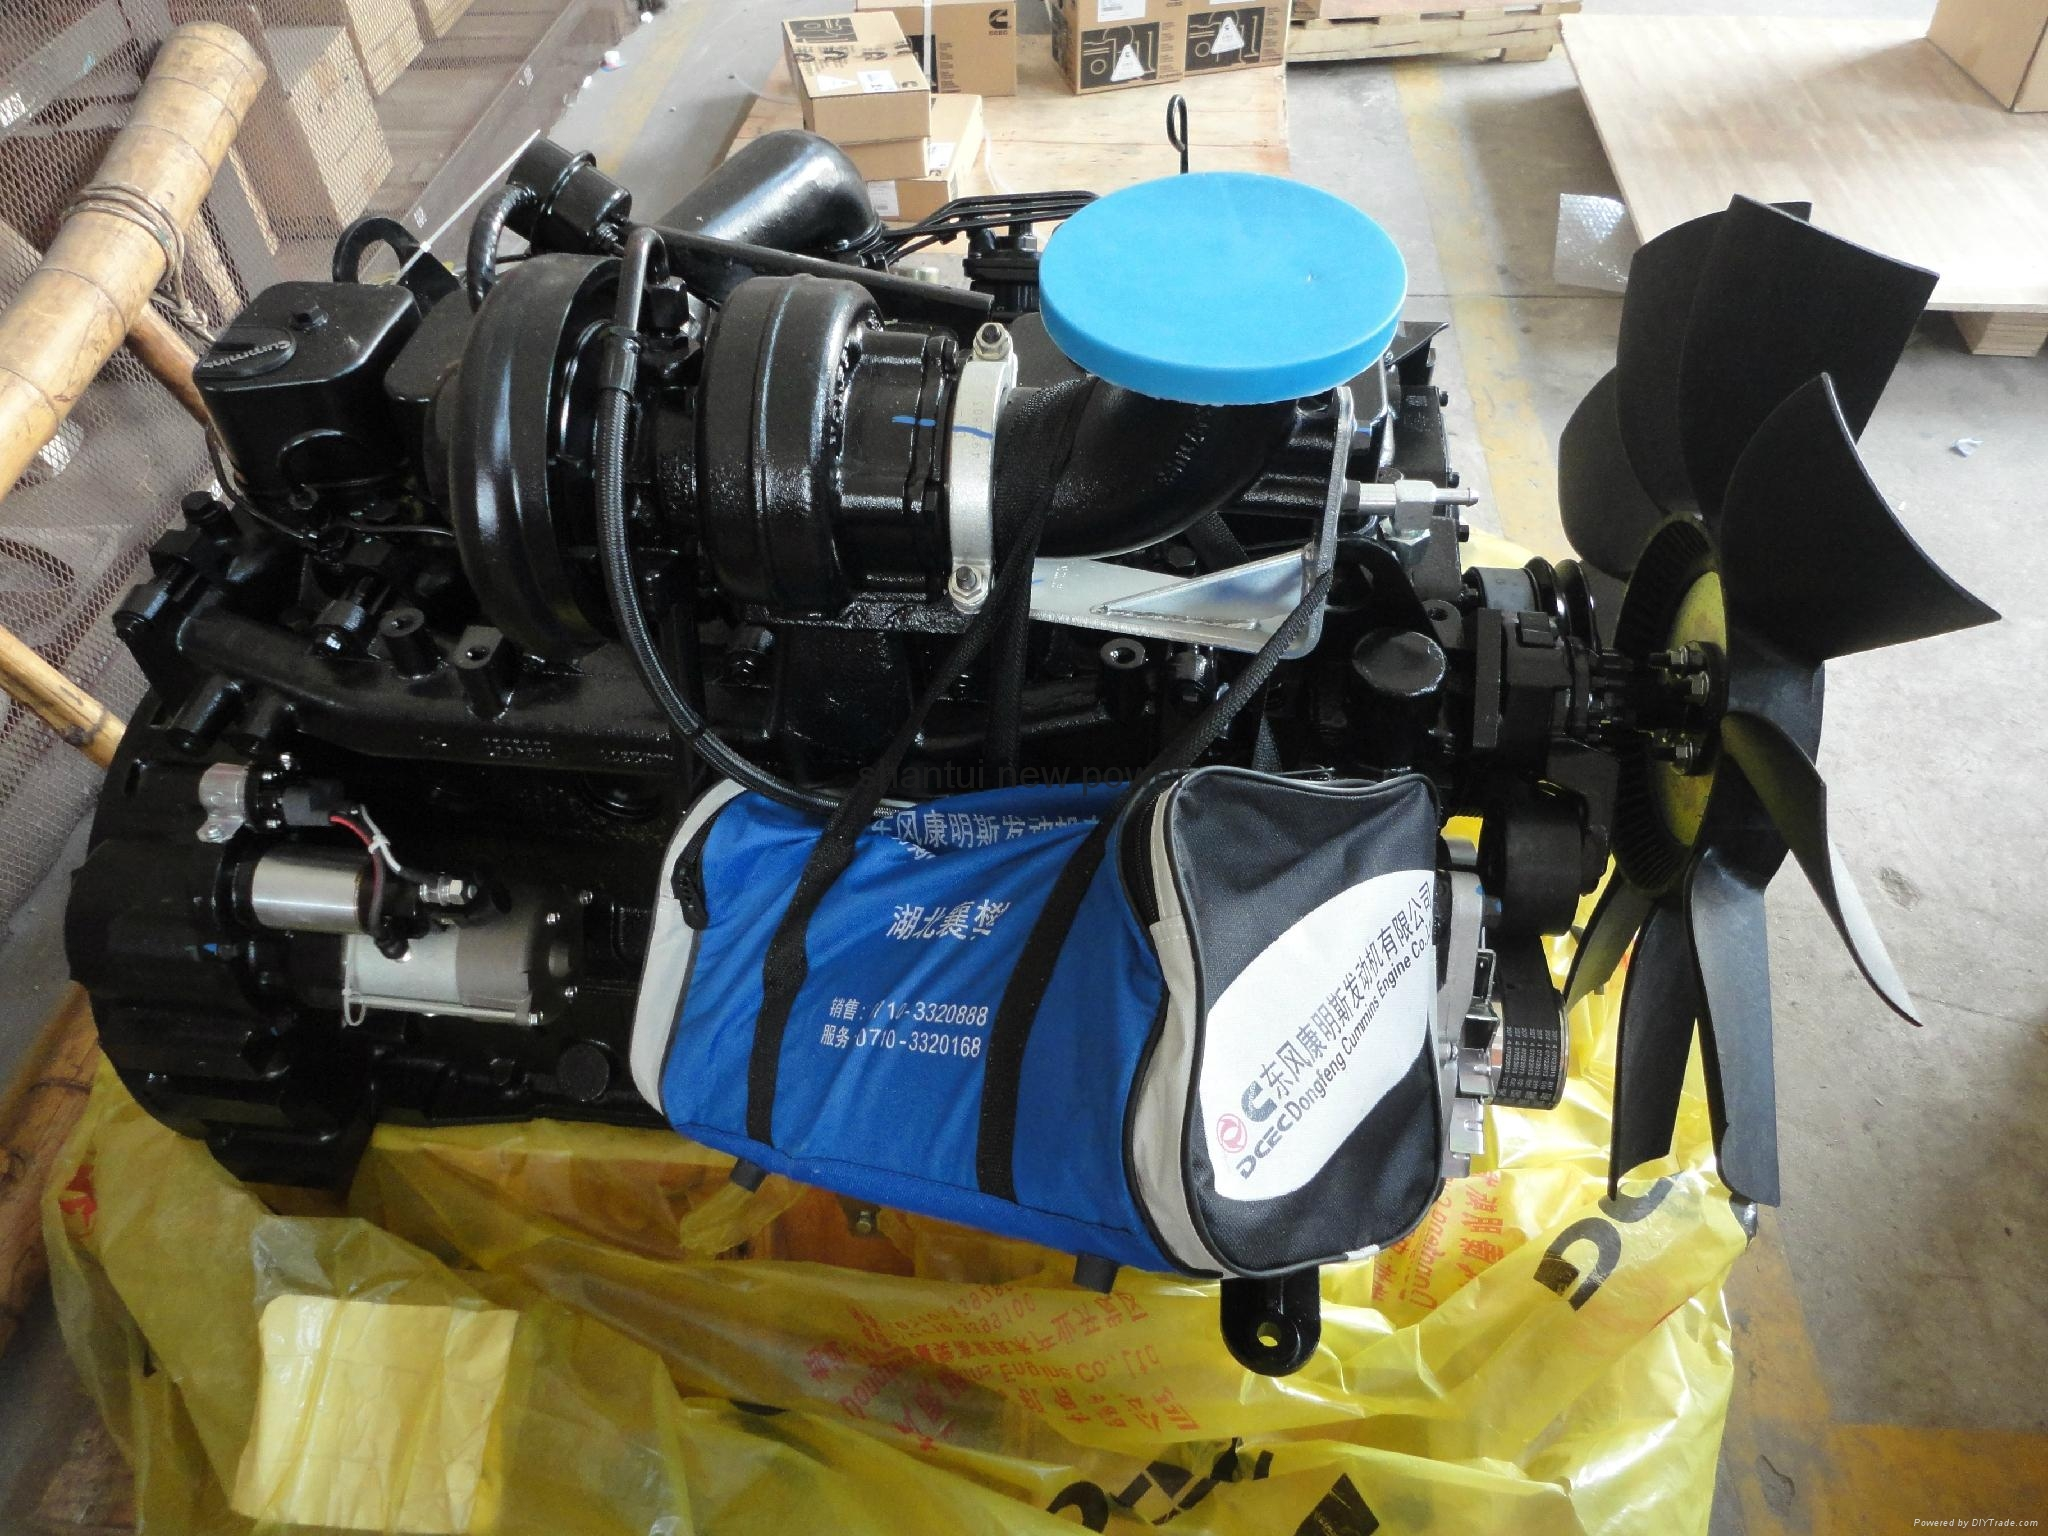 Original Cummins engine 6BT5.9-C150 1